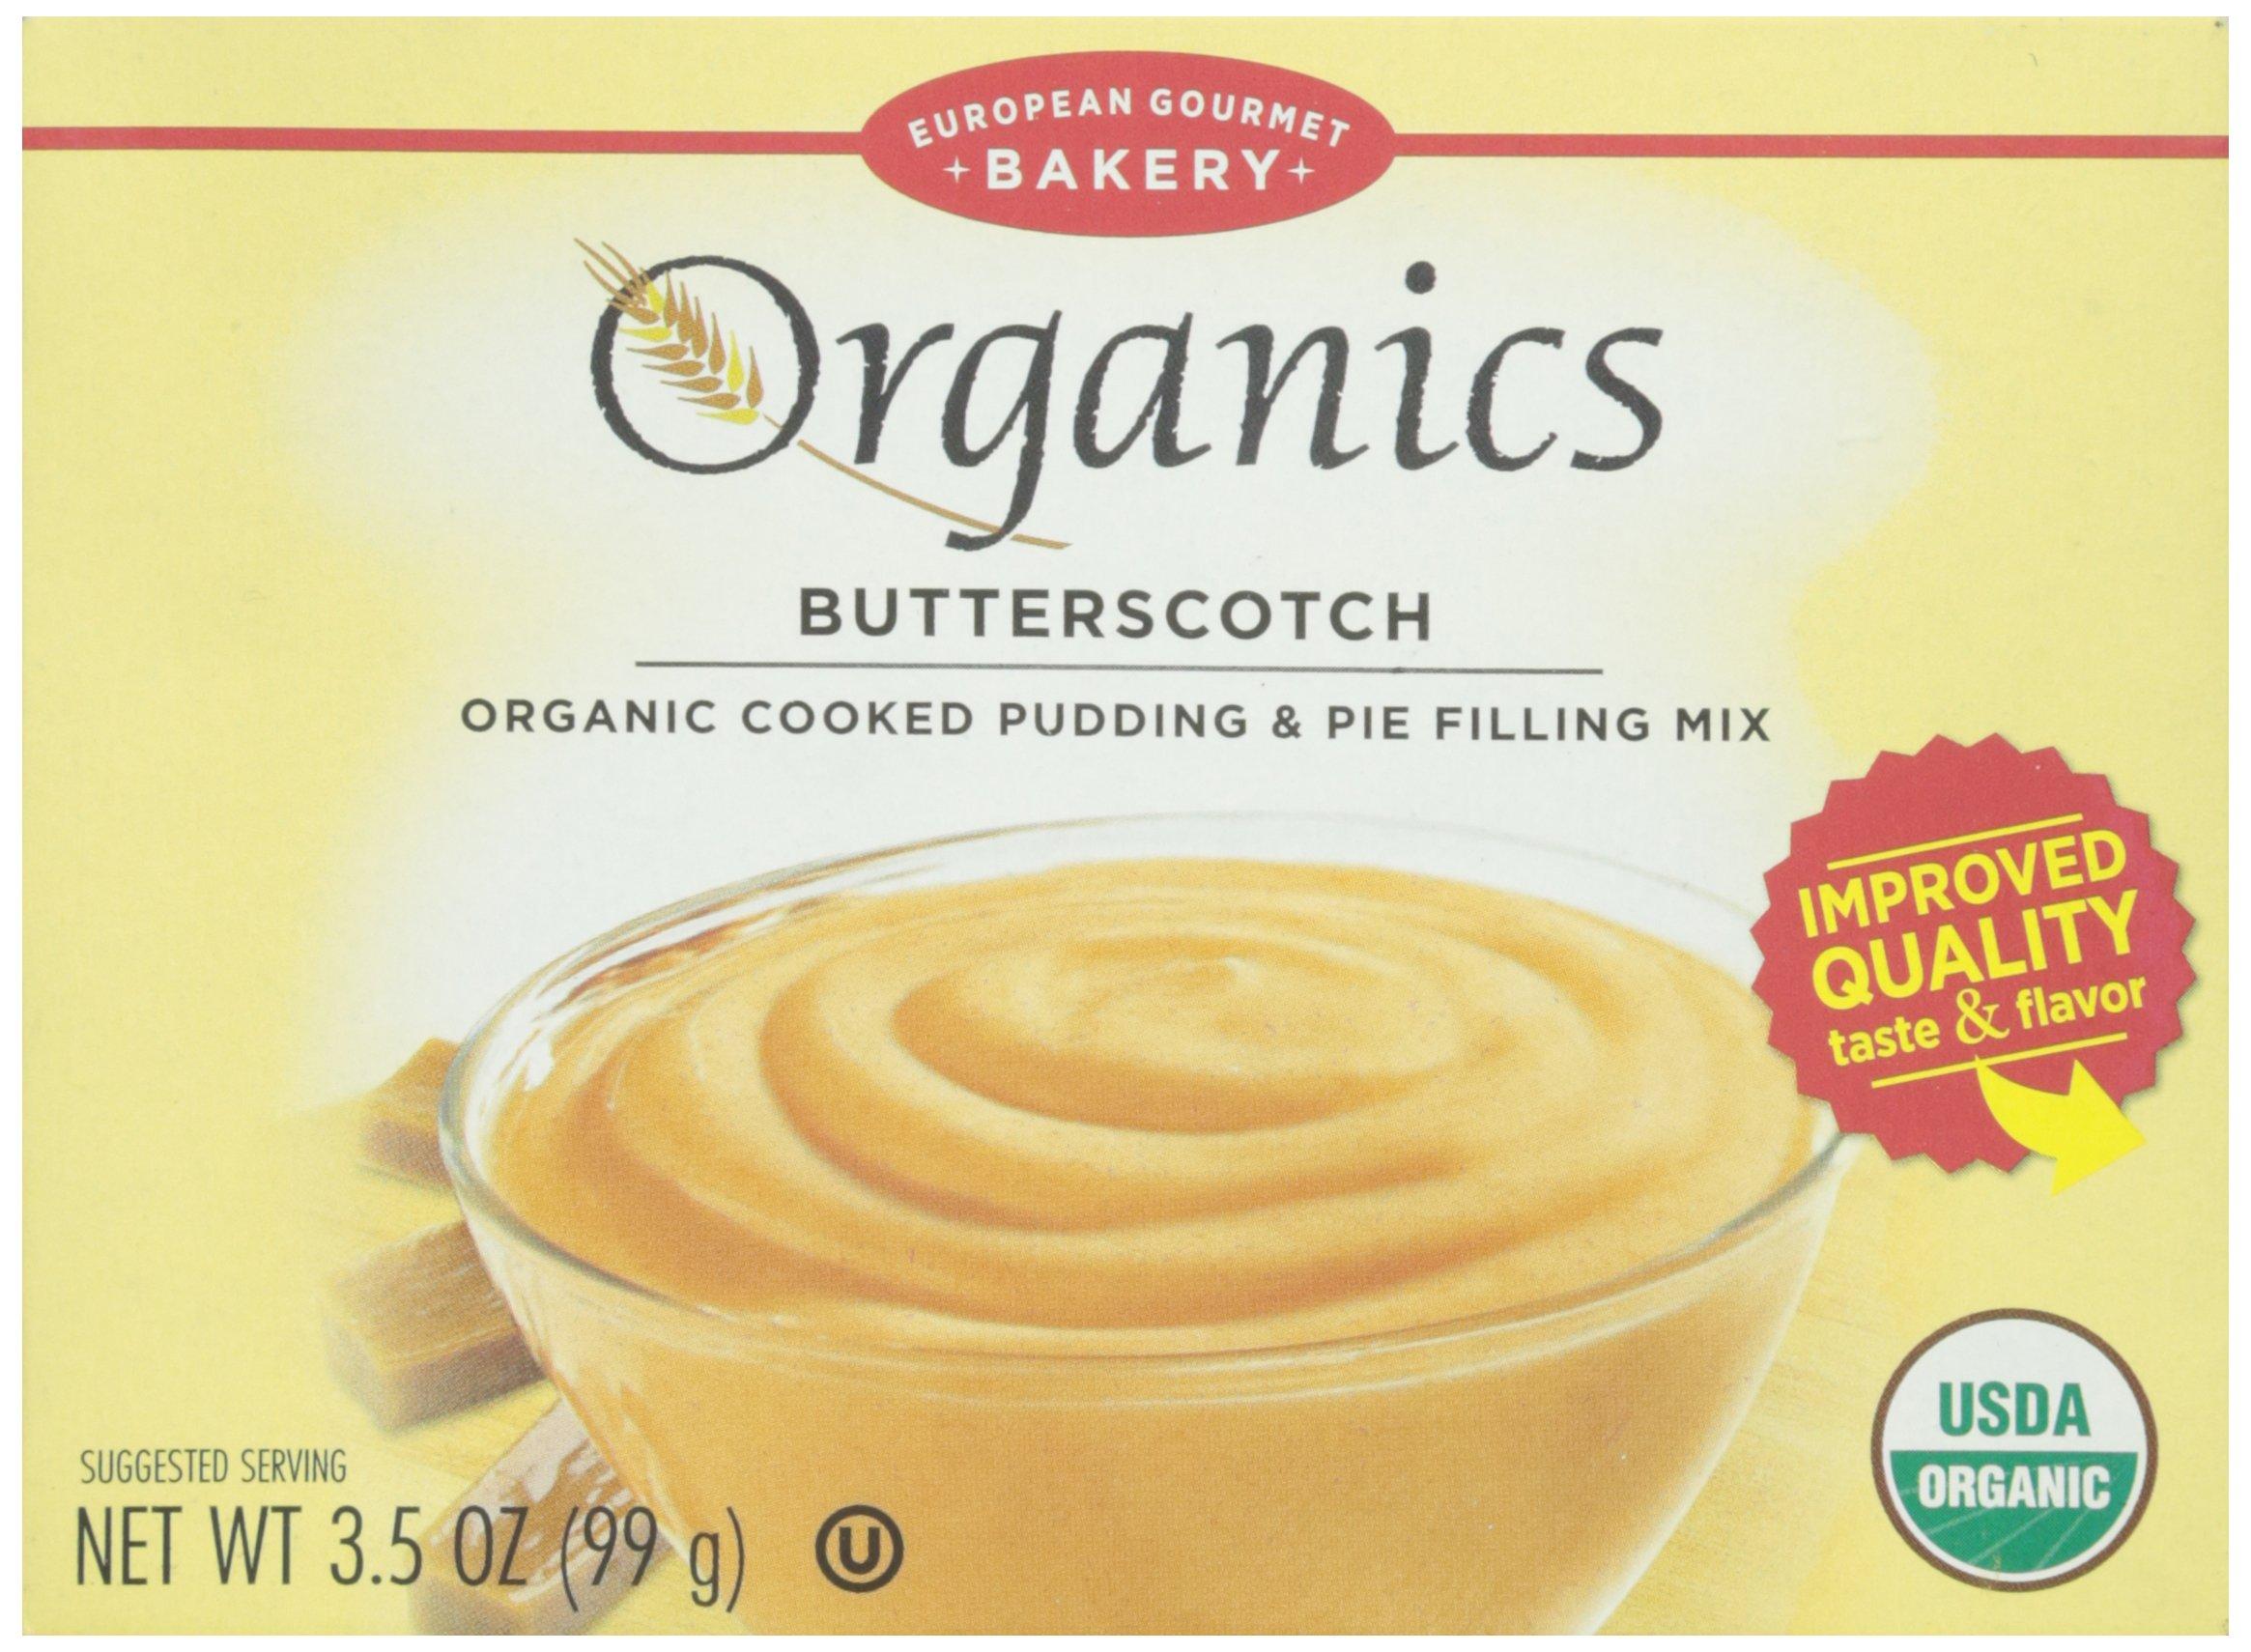 Dr. Oetker, Pudding Mix, Butterscotch, Organic, 3.5 oz